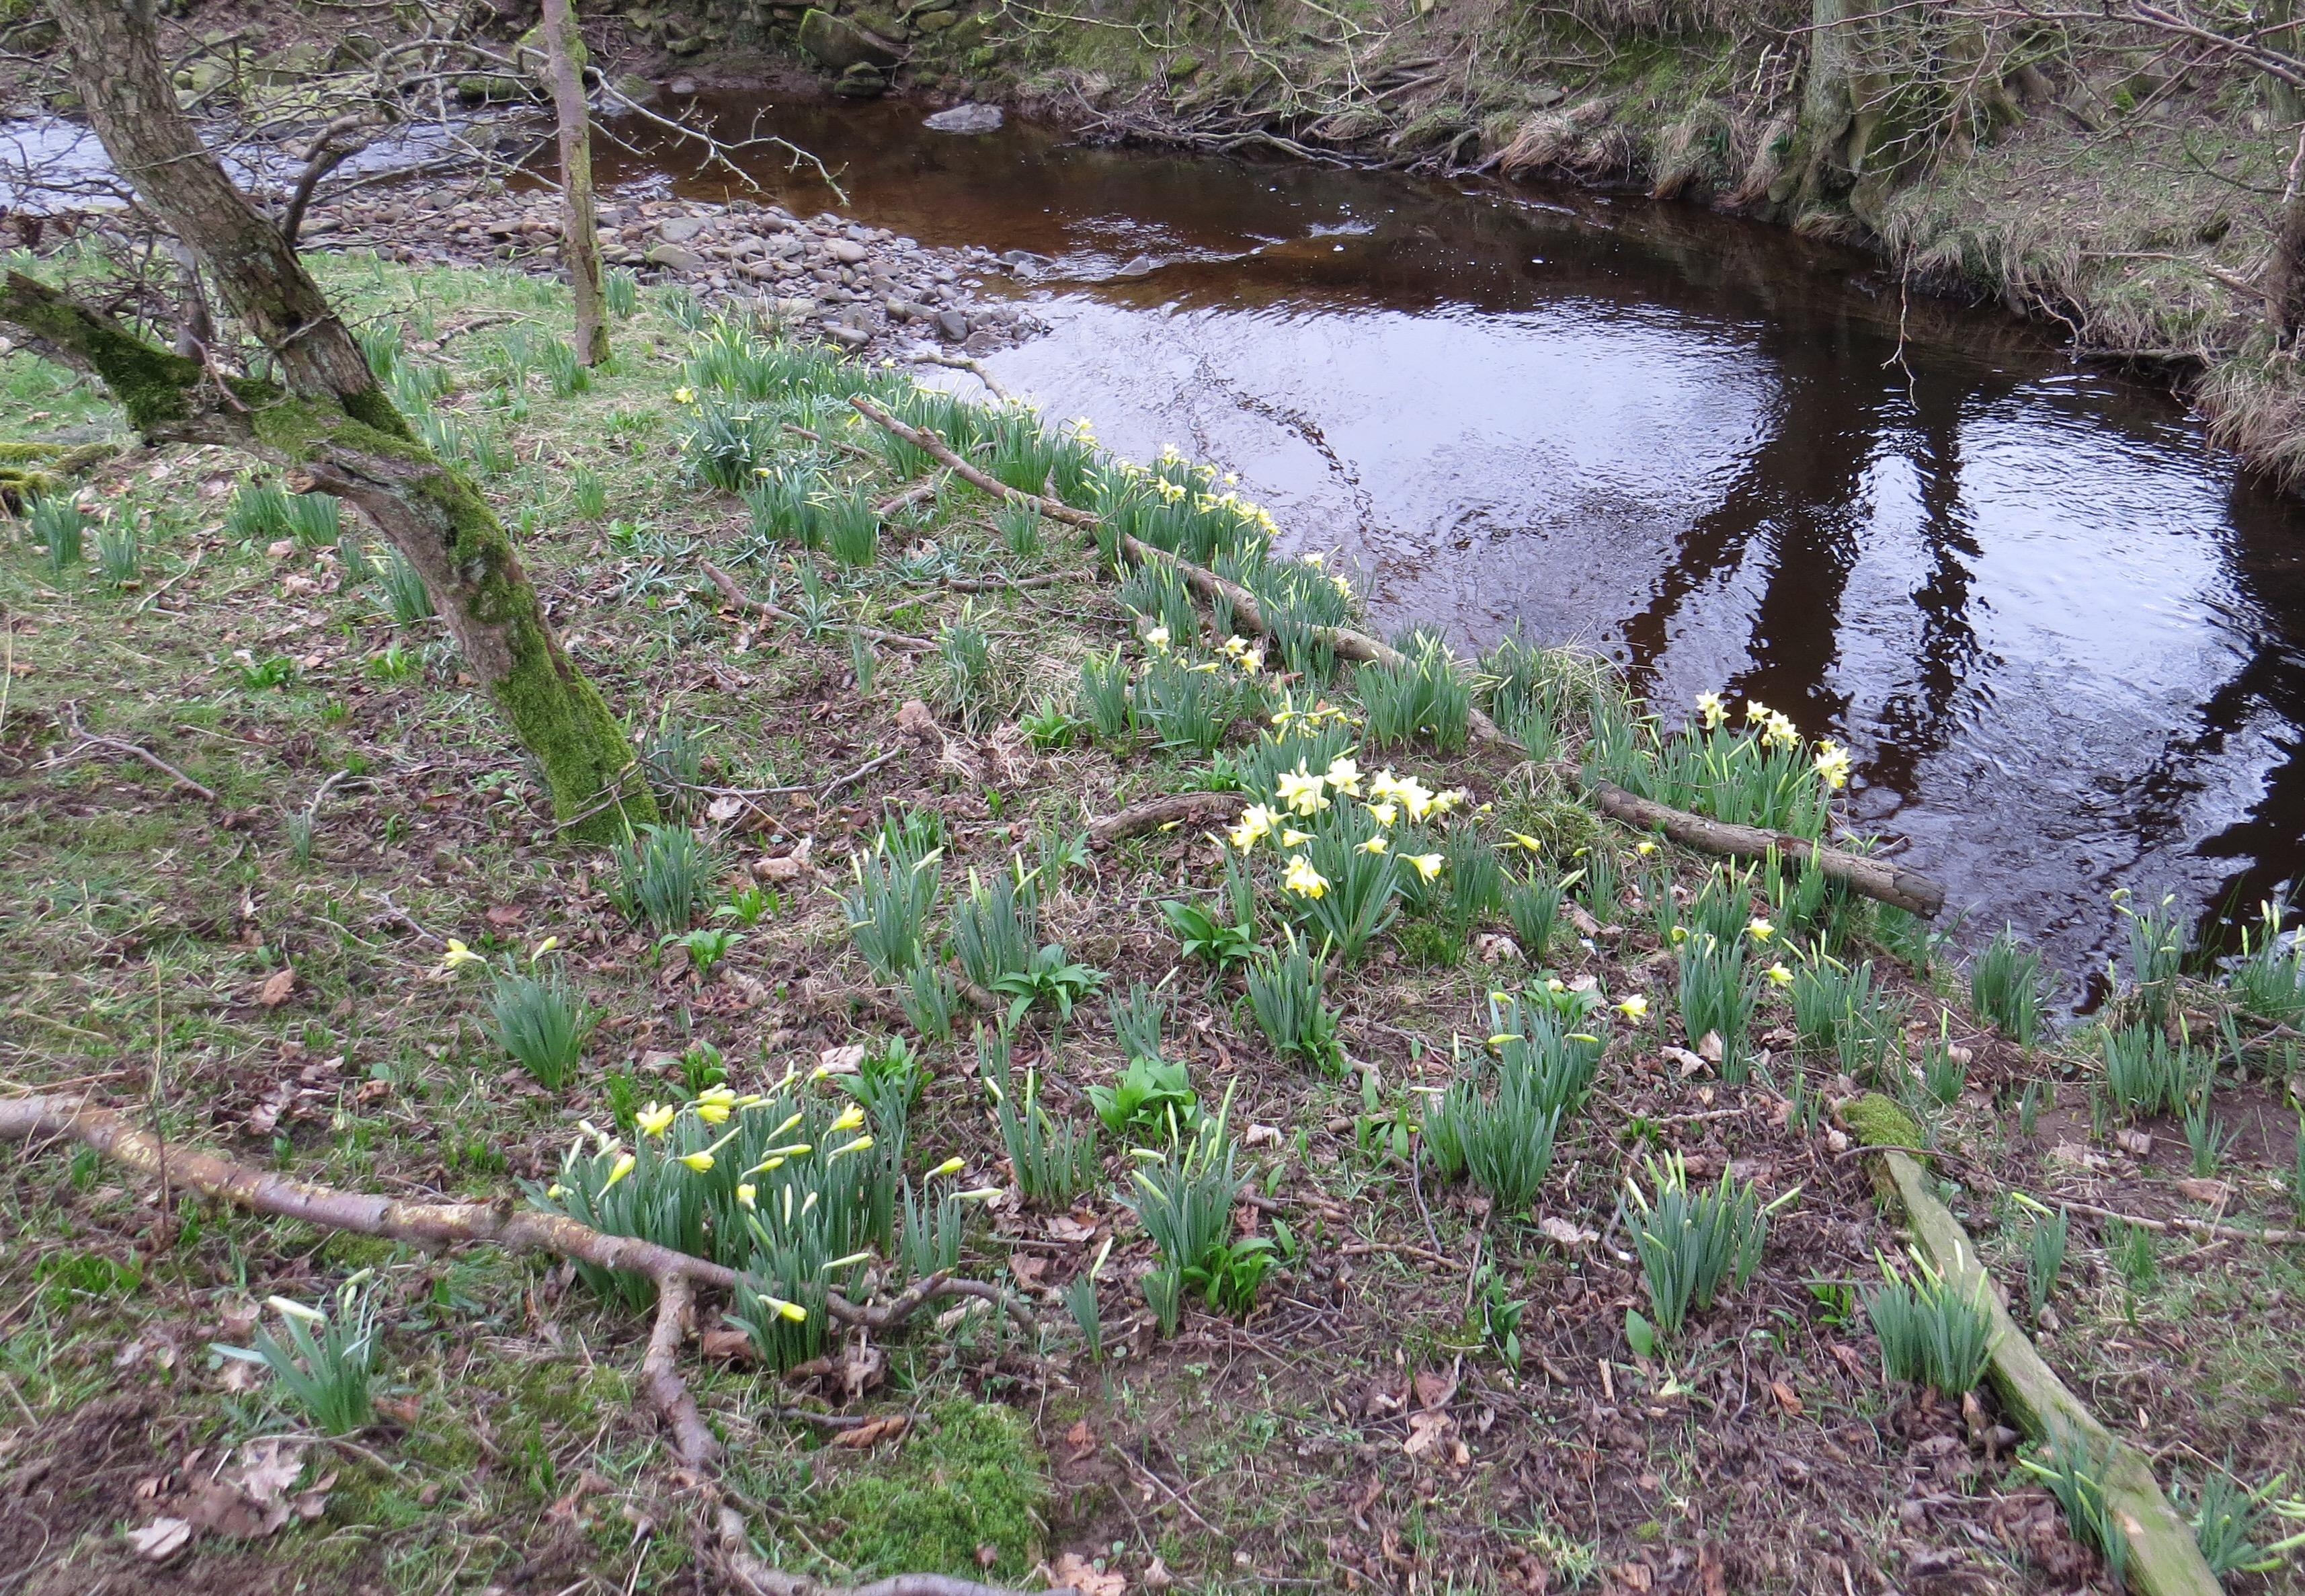 wild daffodils, narcissus pseudonarcissus